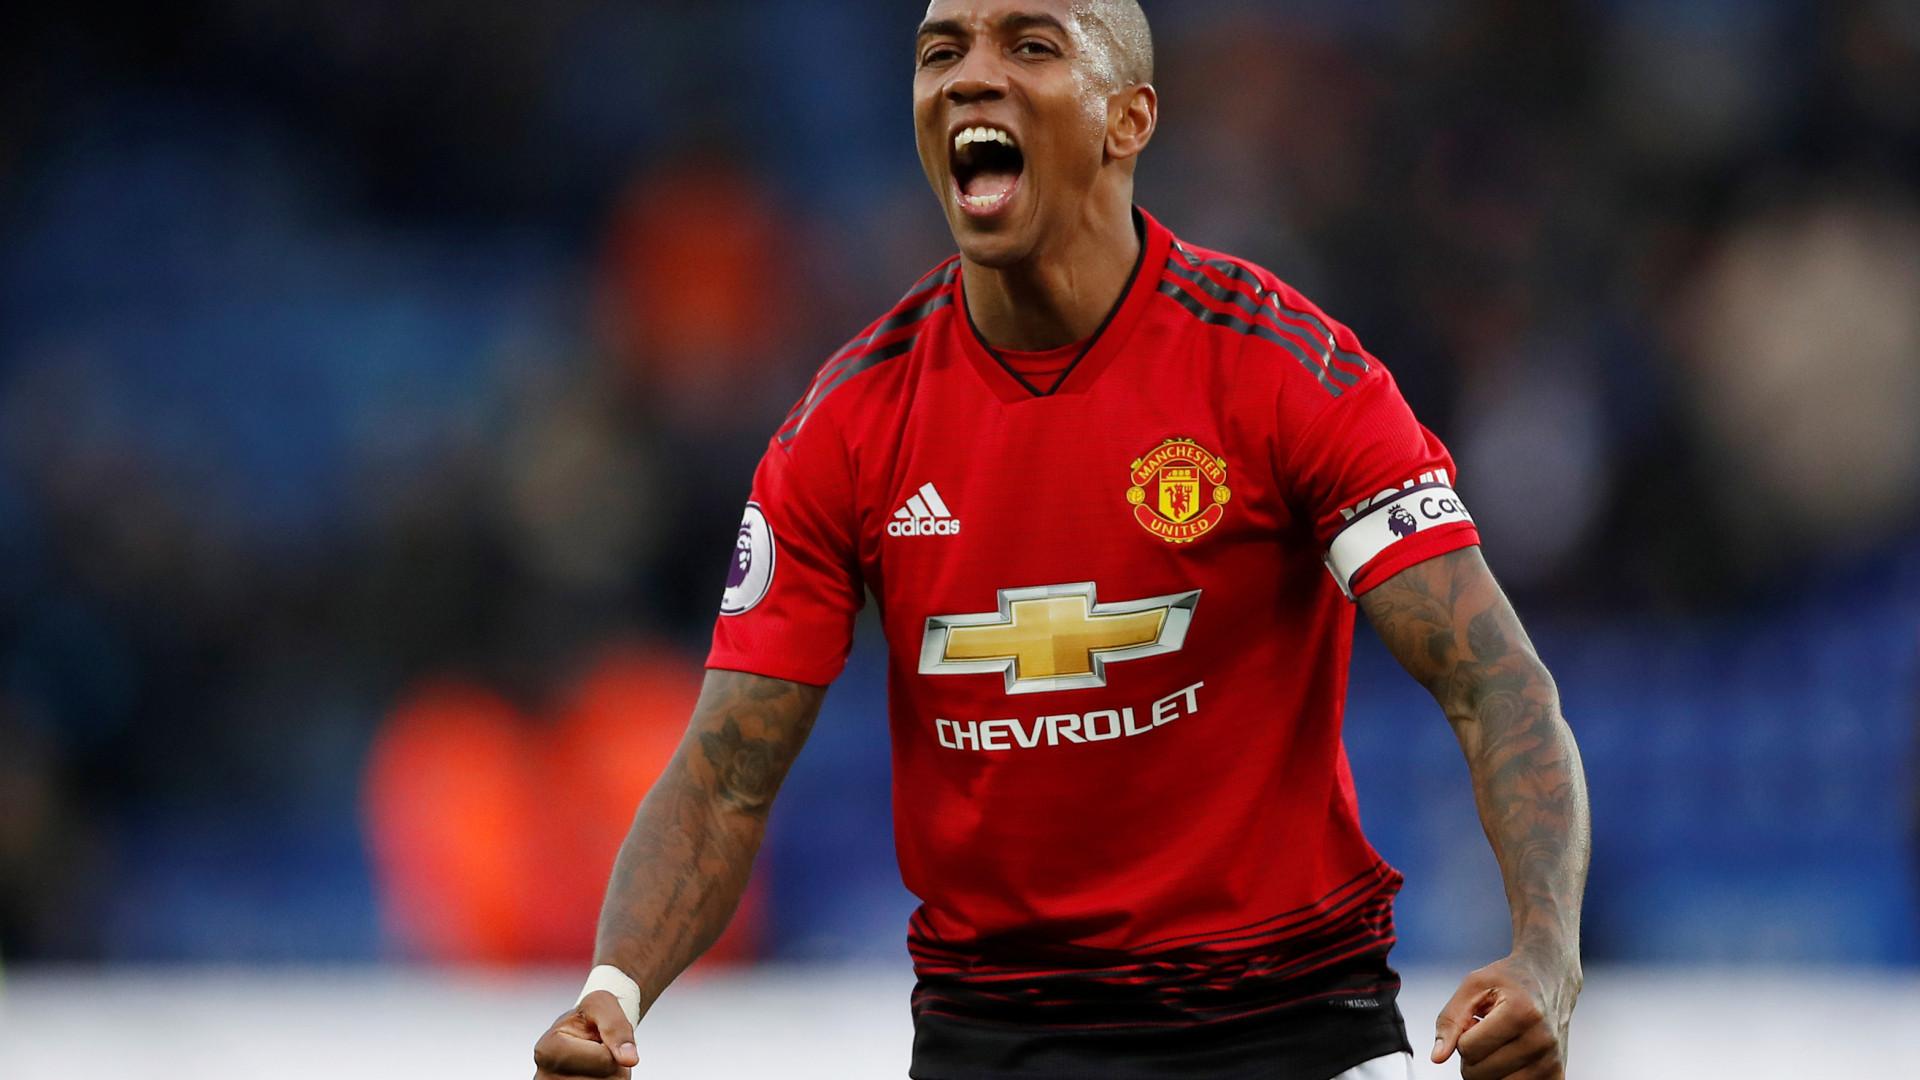 Oficial: Ashley Young prolonga contrato com o Manchester United